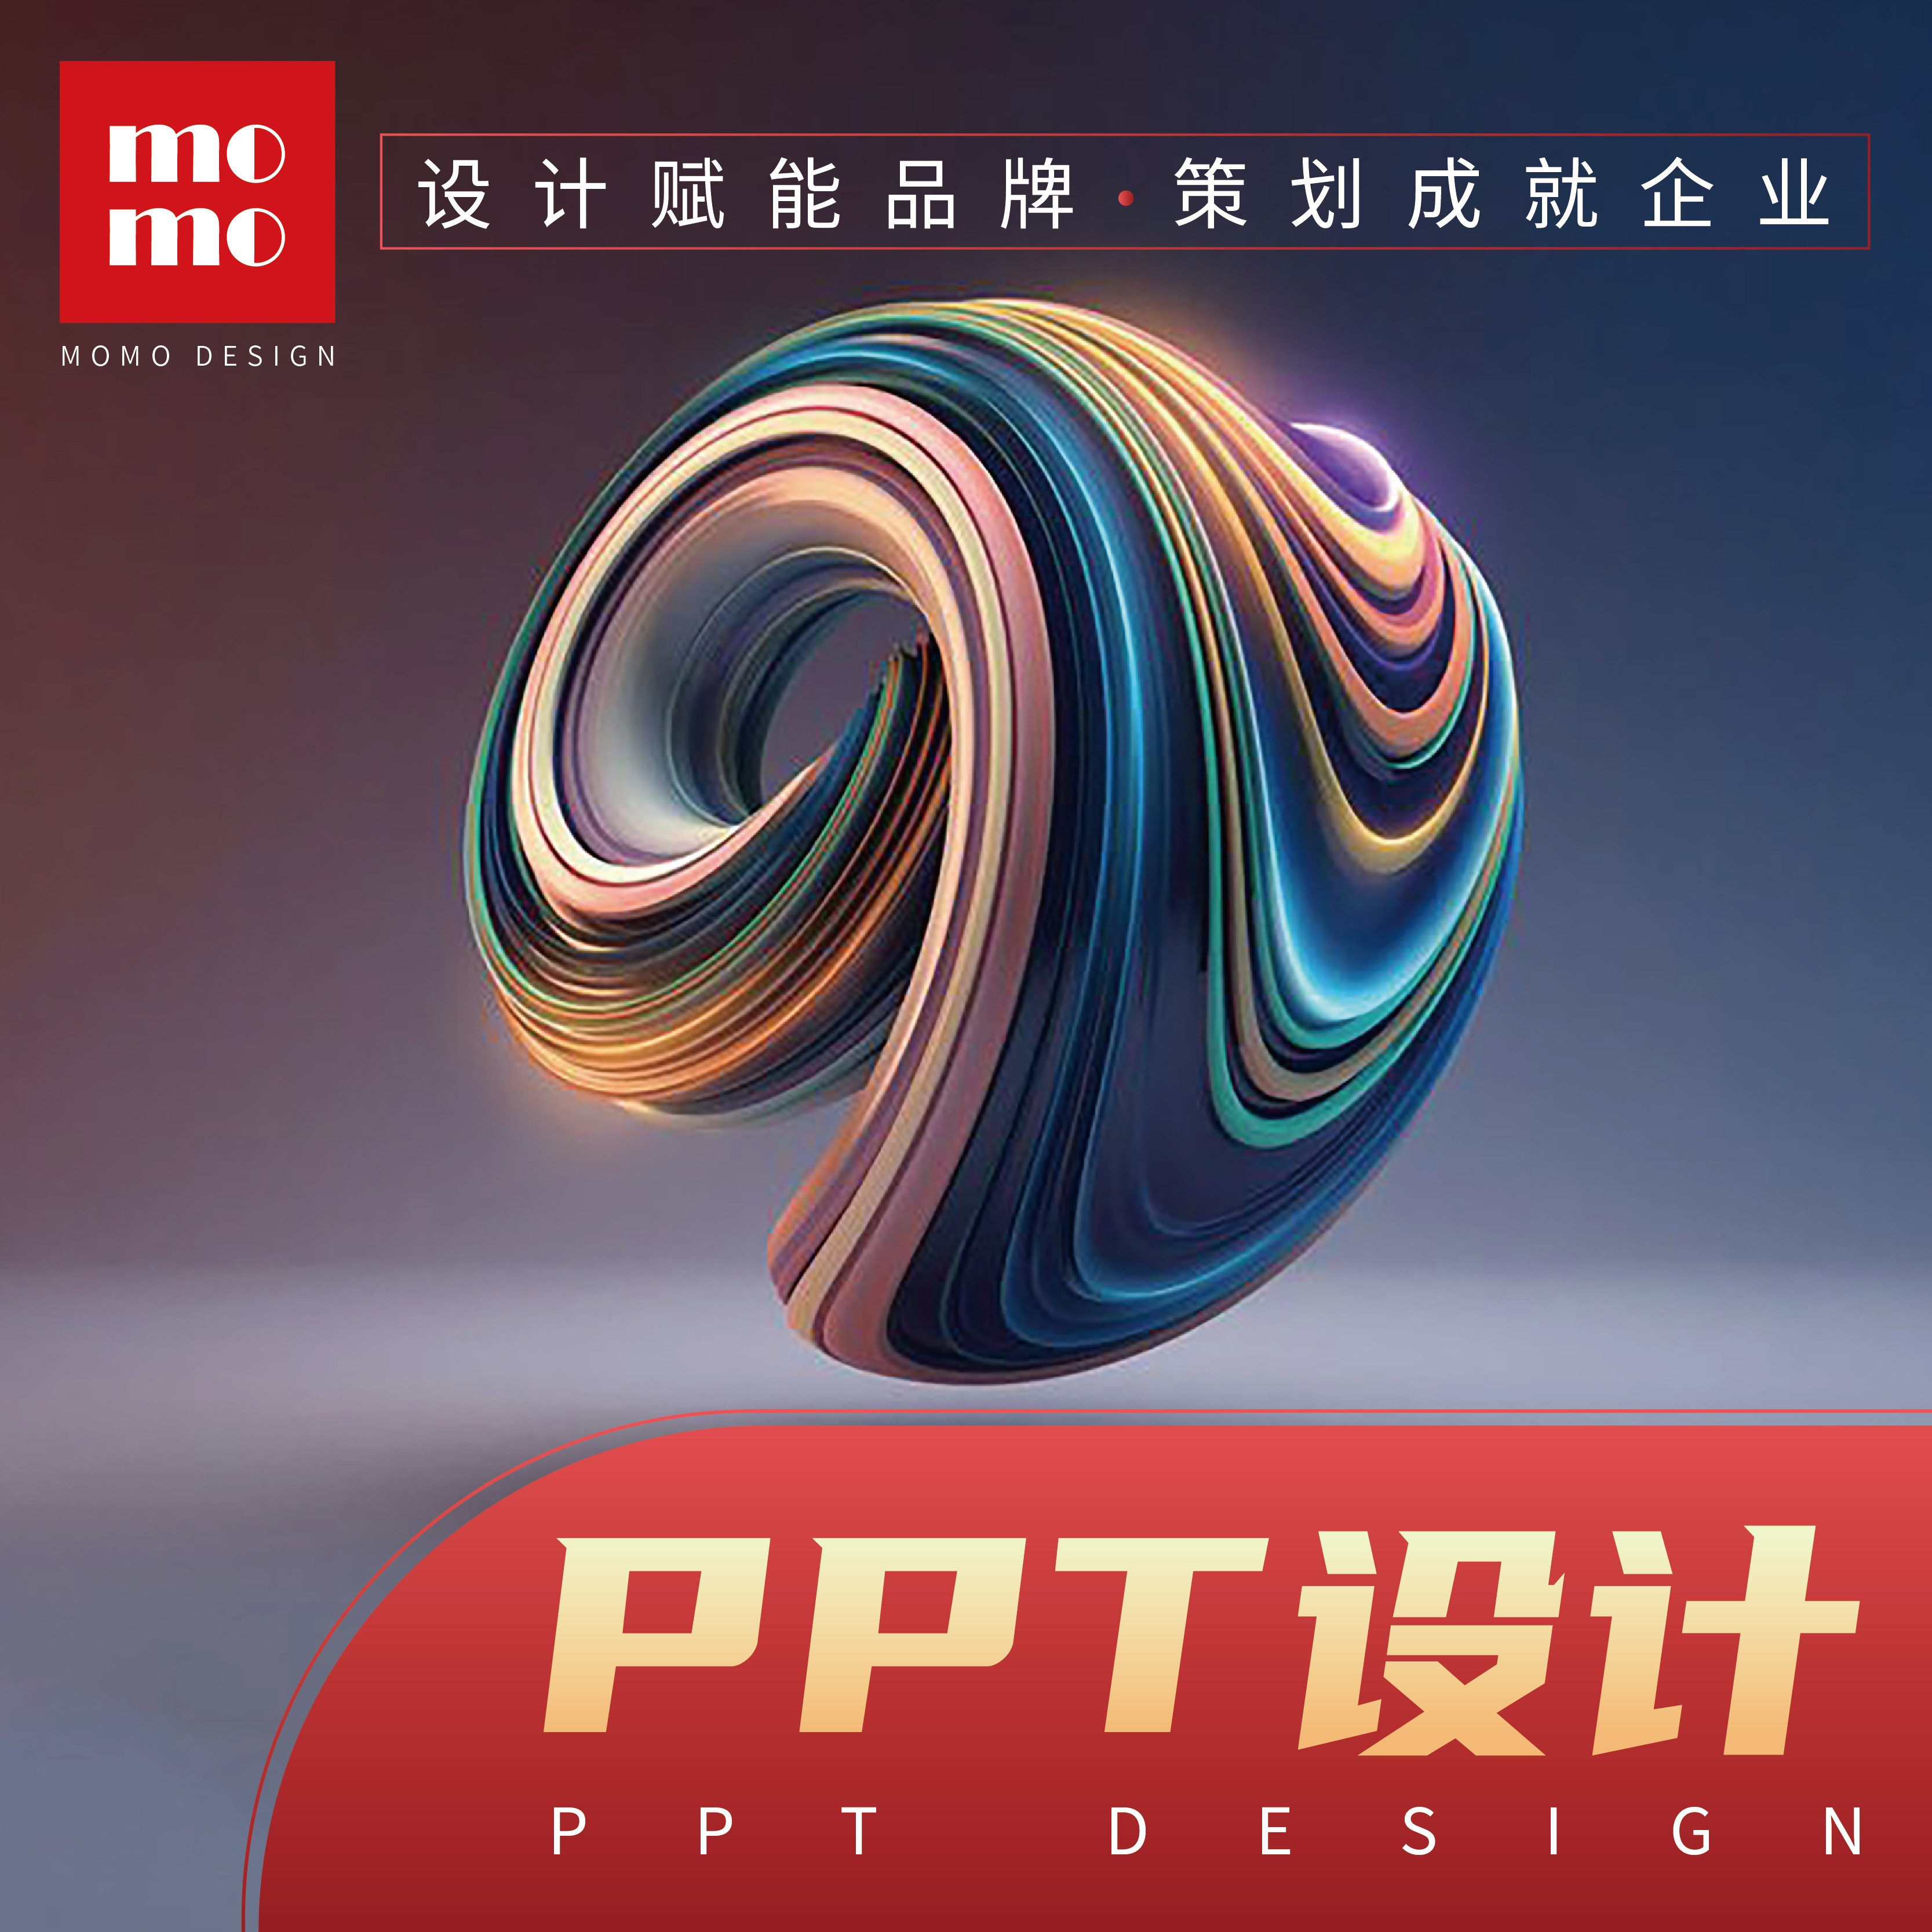 【PPT设计包月】工作汇报演讲/发布会/产品介绍/简历/答辩